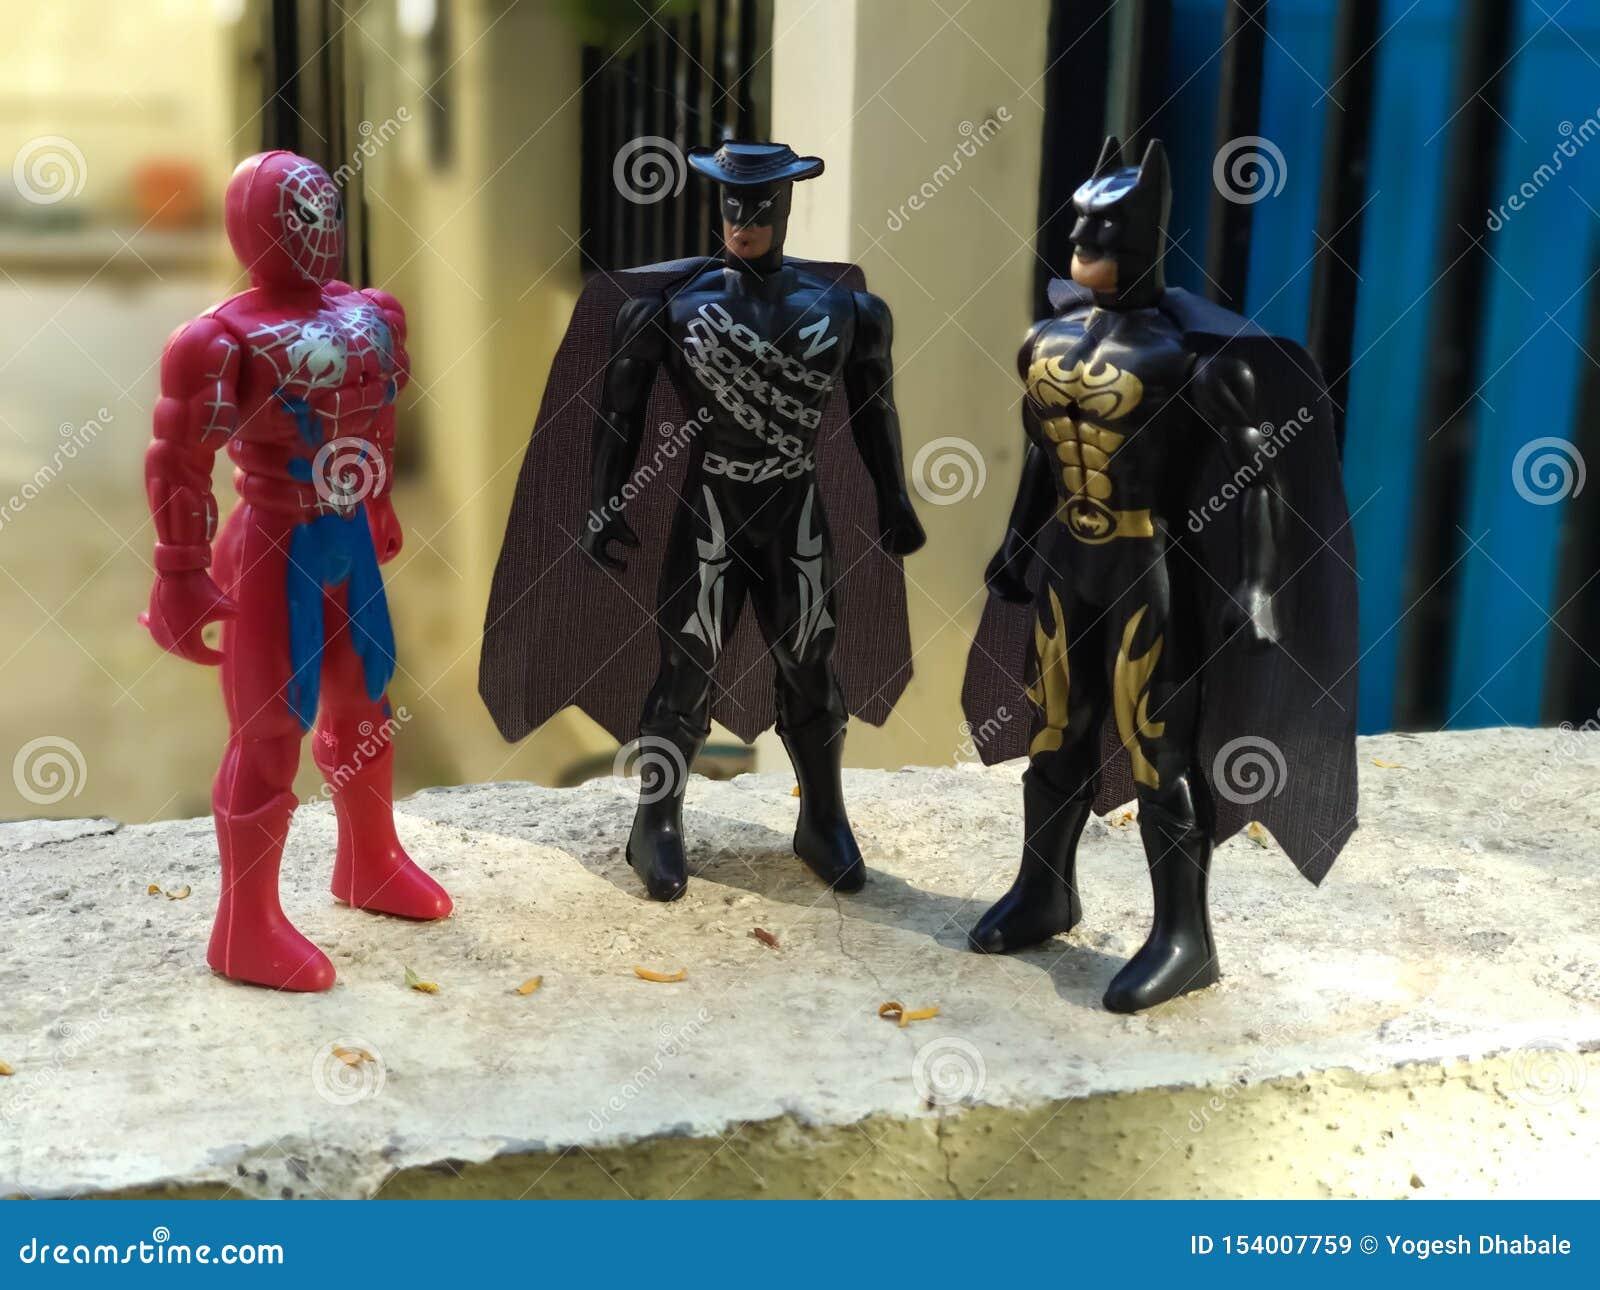 Marvel superheros in toys form